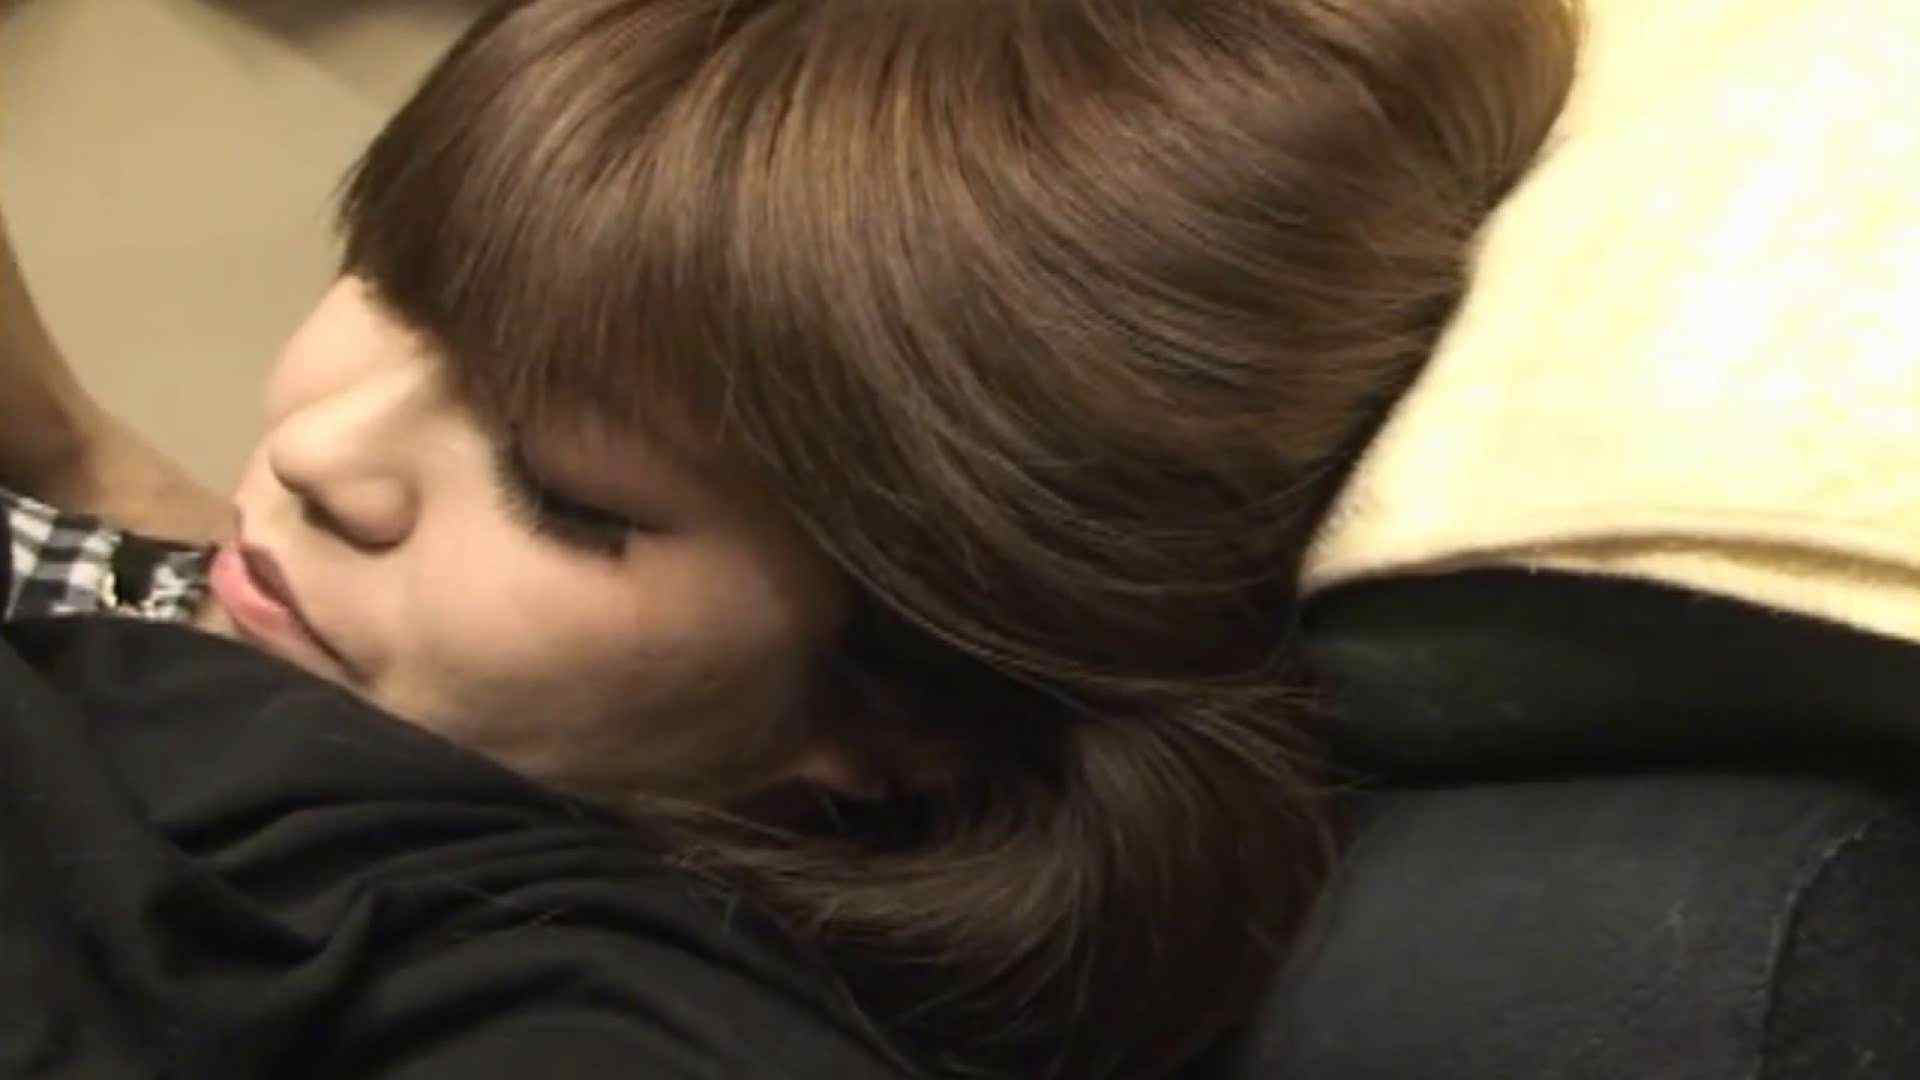 S級厳選美女ビッチガールVol.15 美女ヌード天国 のぞき動画画像 83PIX 2